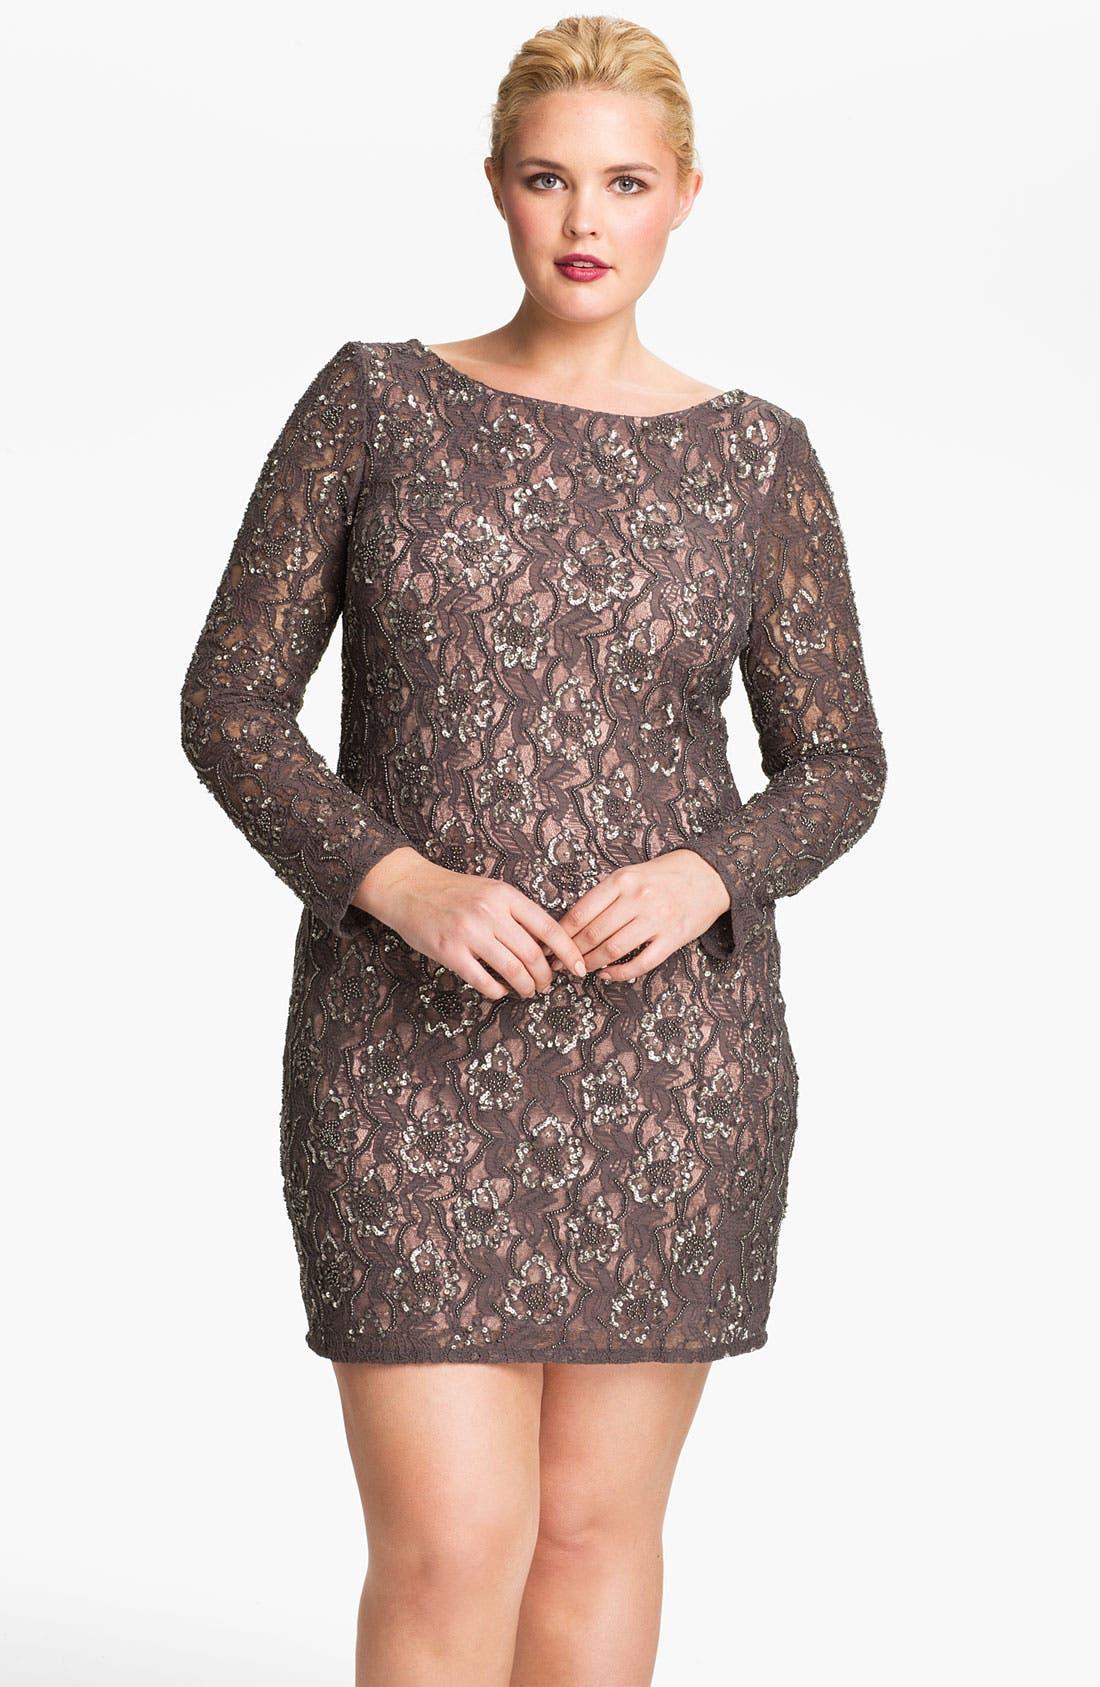 Alternate Image 1 Selected - Aidan Mattox Embellished V-Back Lace Sheath Dress (Plus)